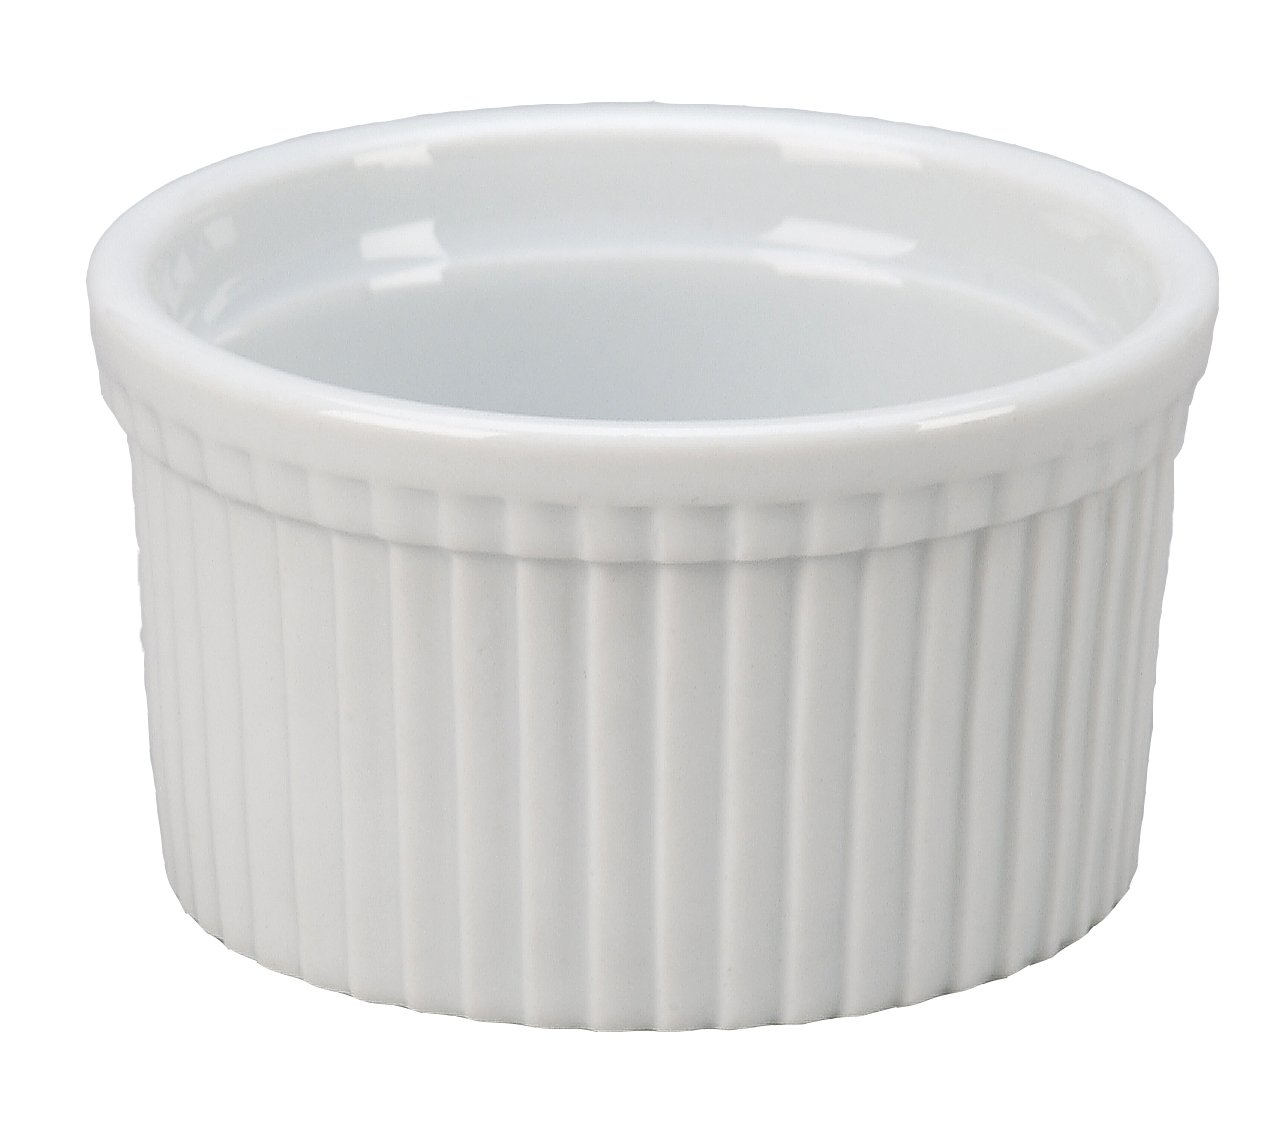 Vertex China RMK-3-P Market Buffet Ramekin, Fluted, 3'', 3 oz., Porcelain White (Pack of 48)